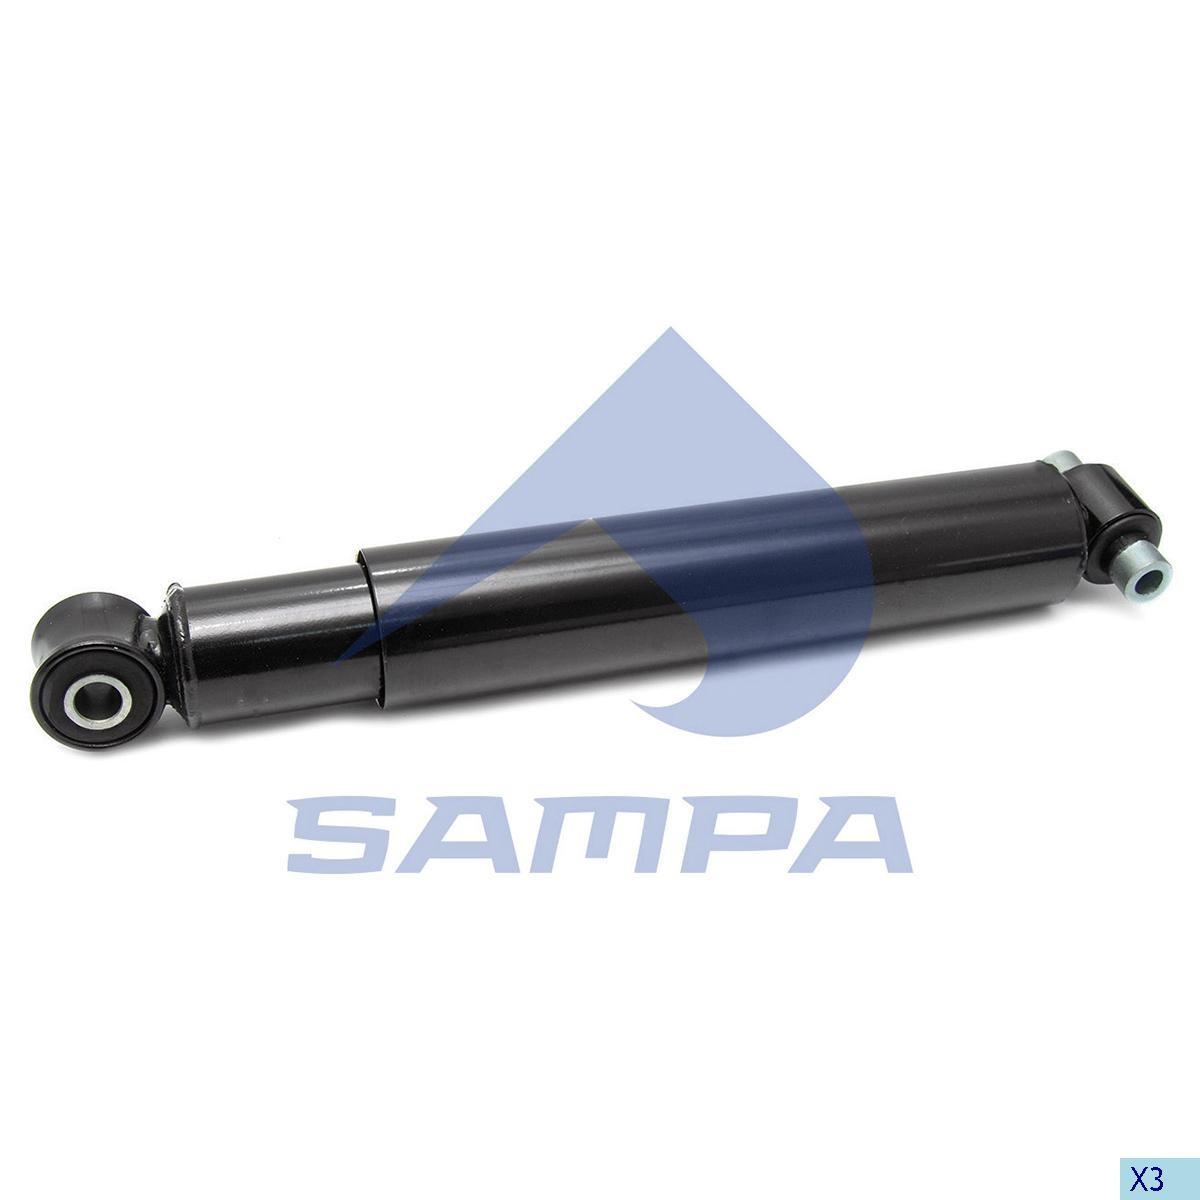 Аммортизатор задний Volvlo FH12 (503-845) 16x20              (890273) photo